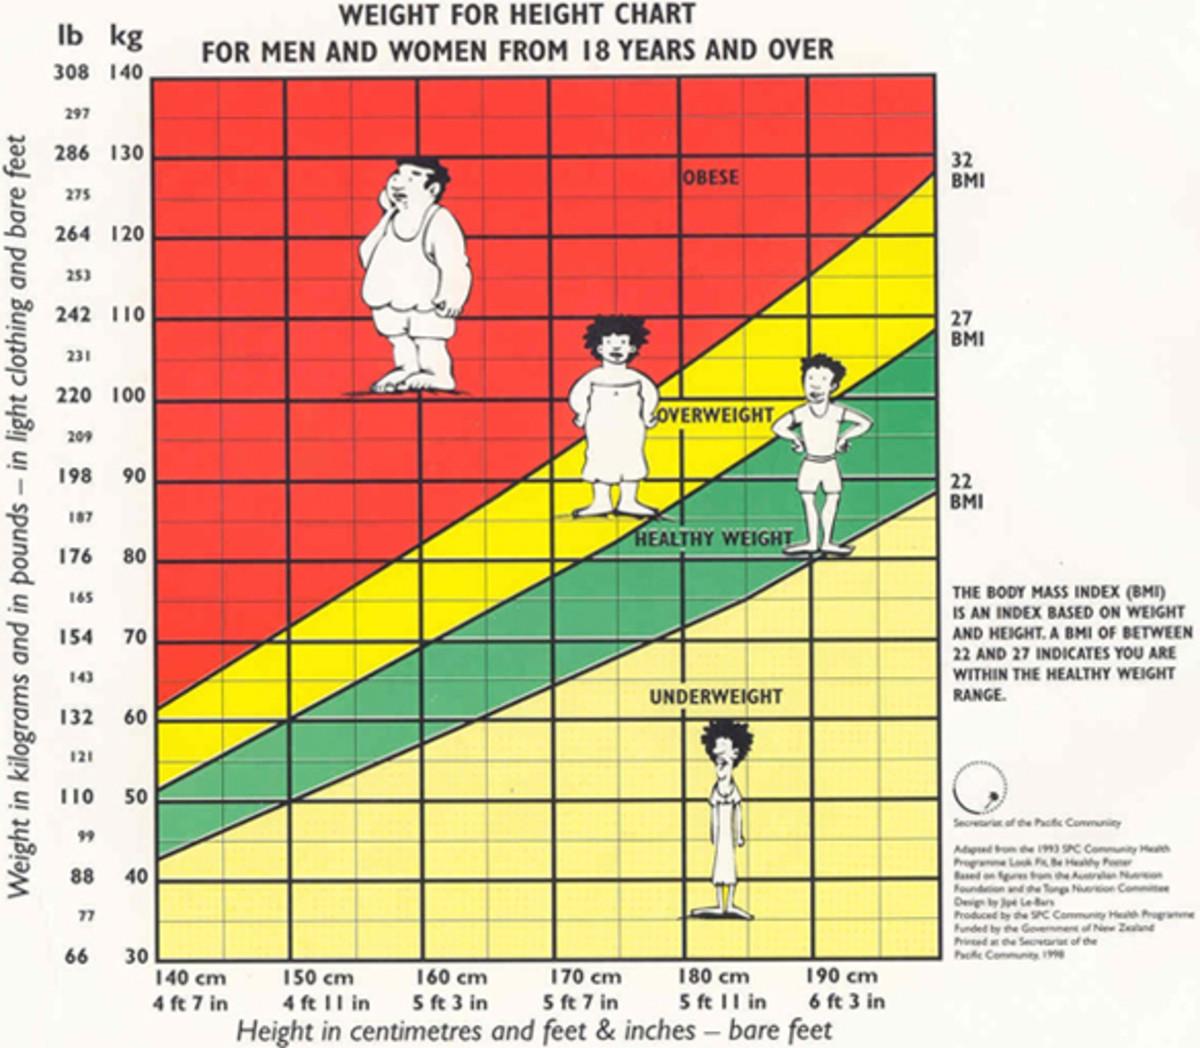 Those BMI folks are so droll!